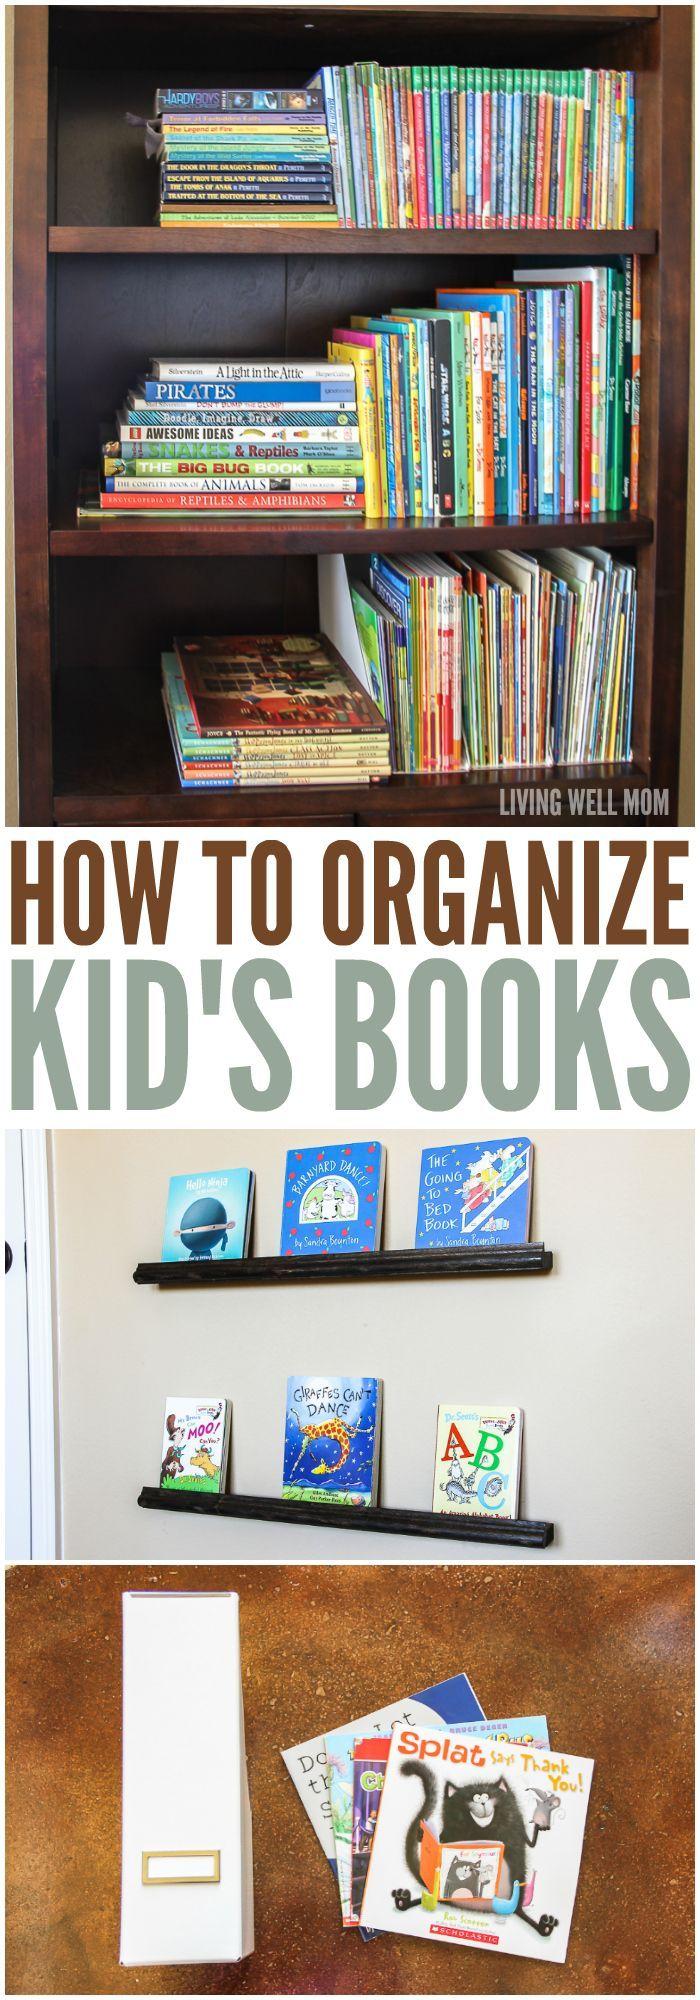 How To Organize Kidsu0027 Books